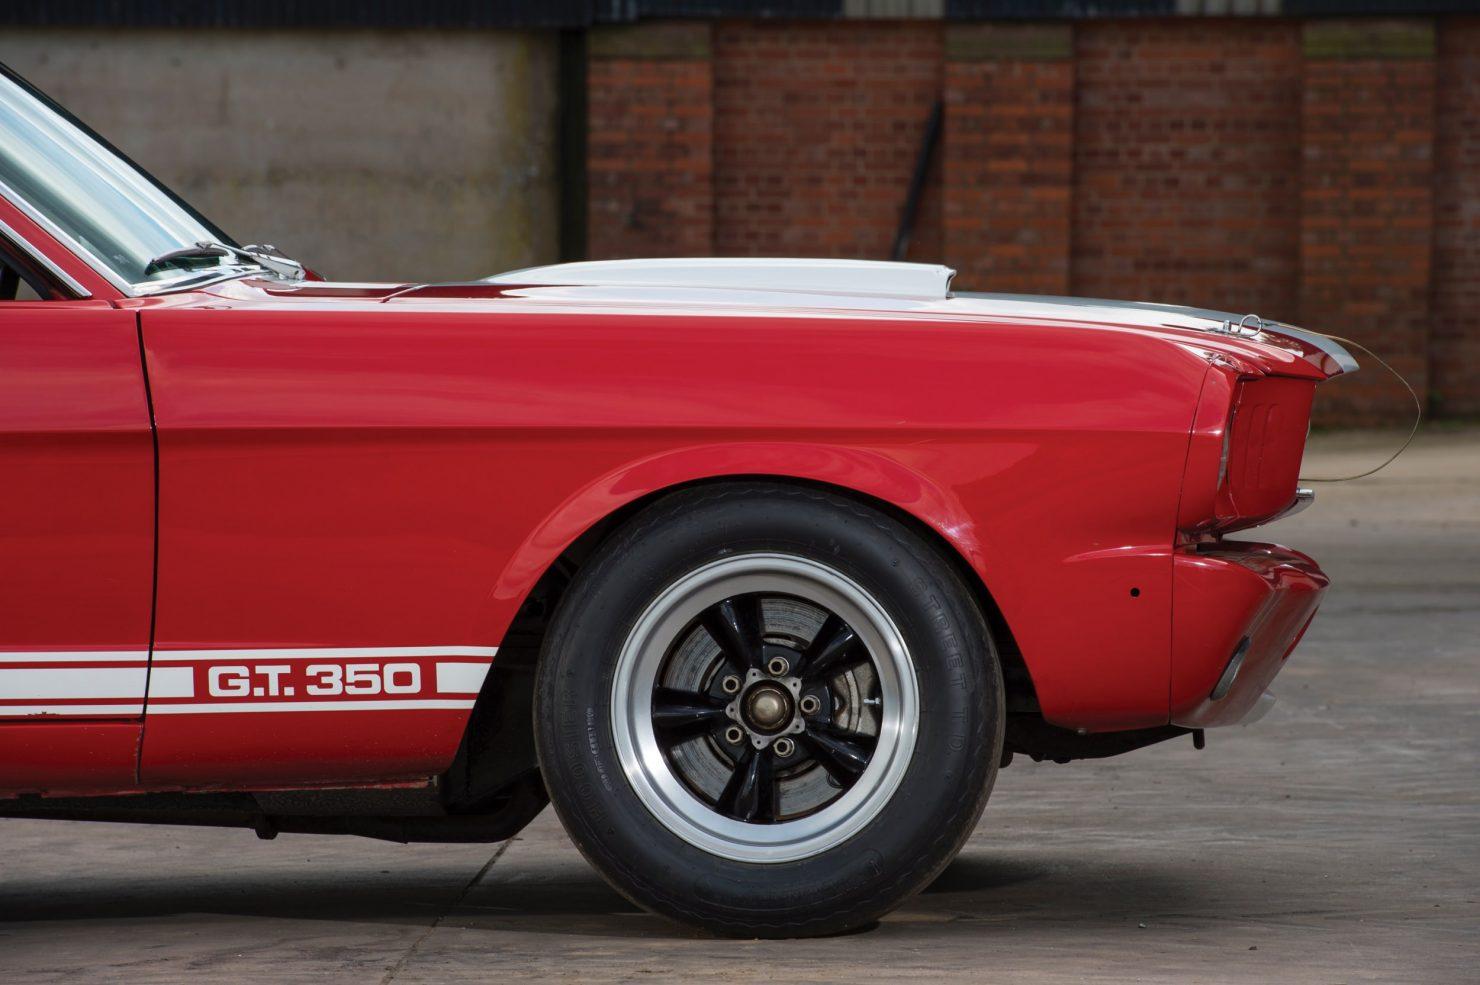 shelby gt350 race car 15 1480x985 - 1966 Shelby GT350 - Period SCCA Race Car